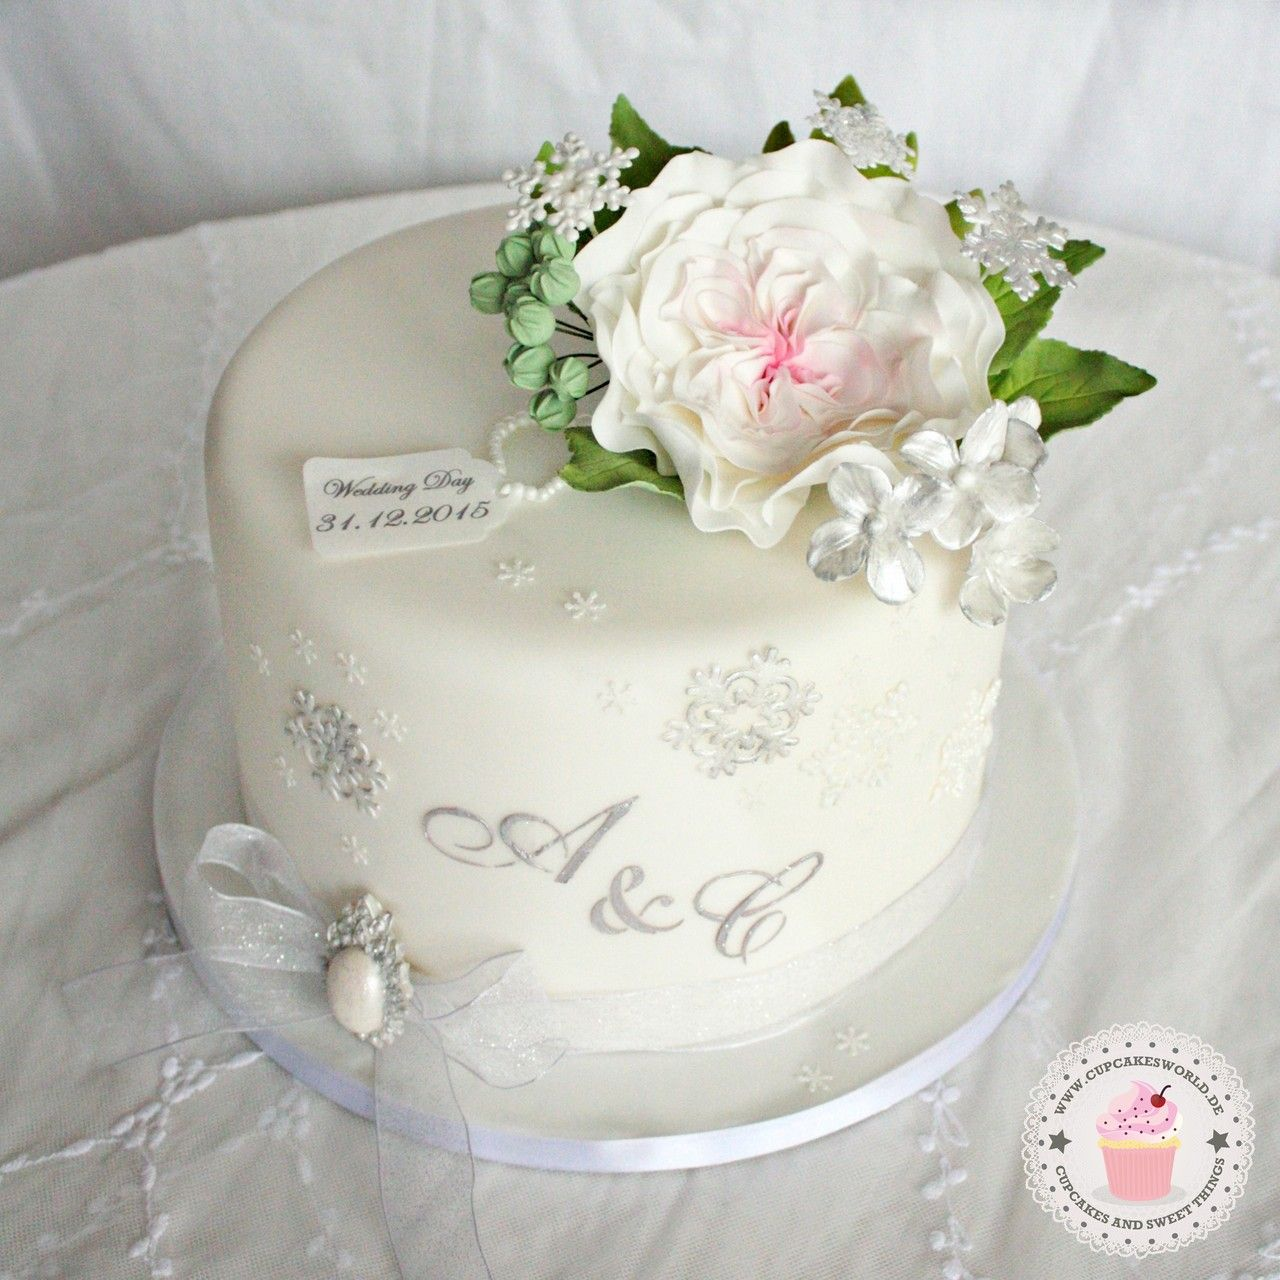 Weddinghochzeit cakes pinterest cake wedding cake and